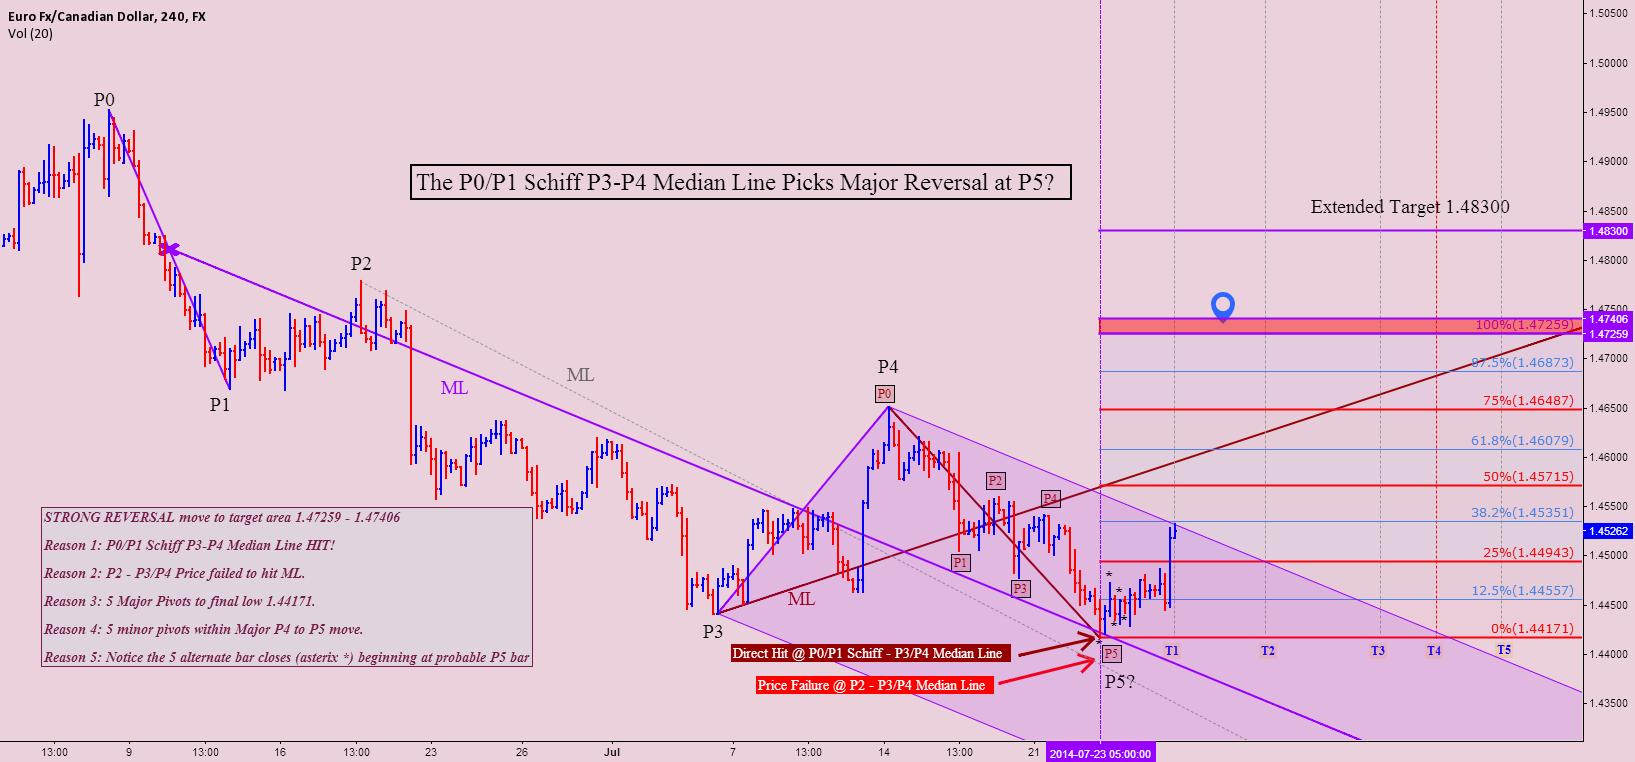 EURCAD The P0/P1 Schiff P3-P4 ML Picks Major Reversal at P5?